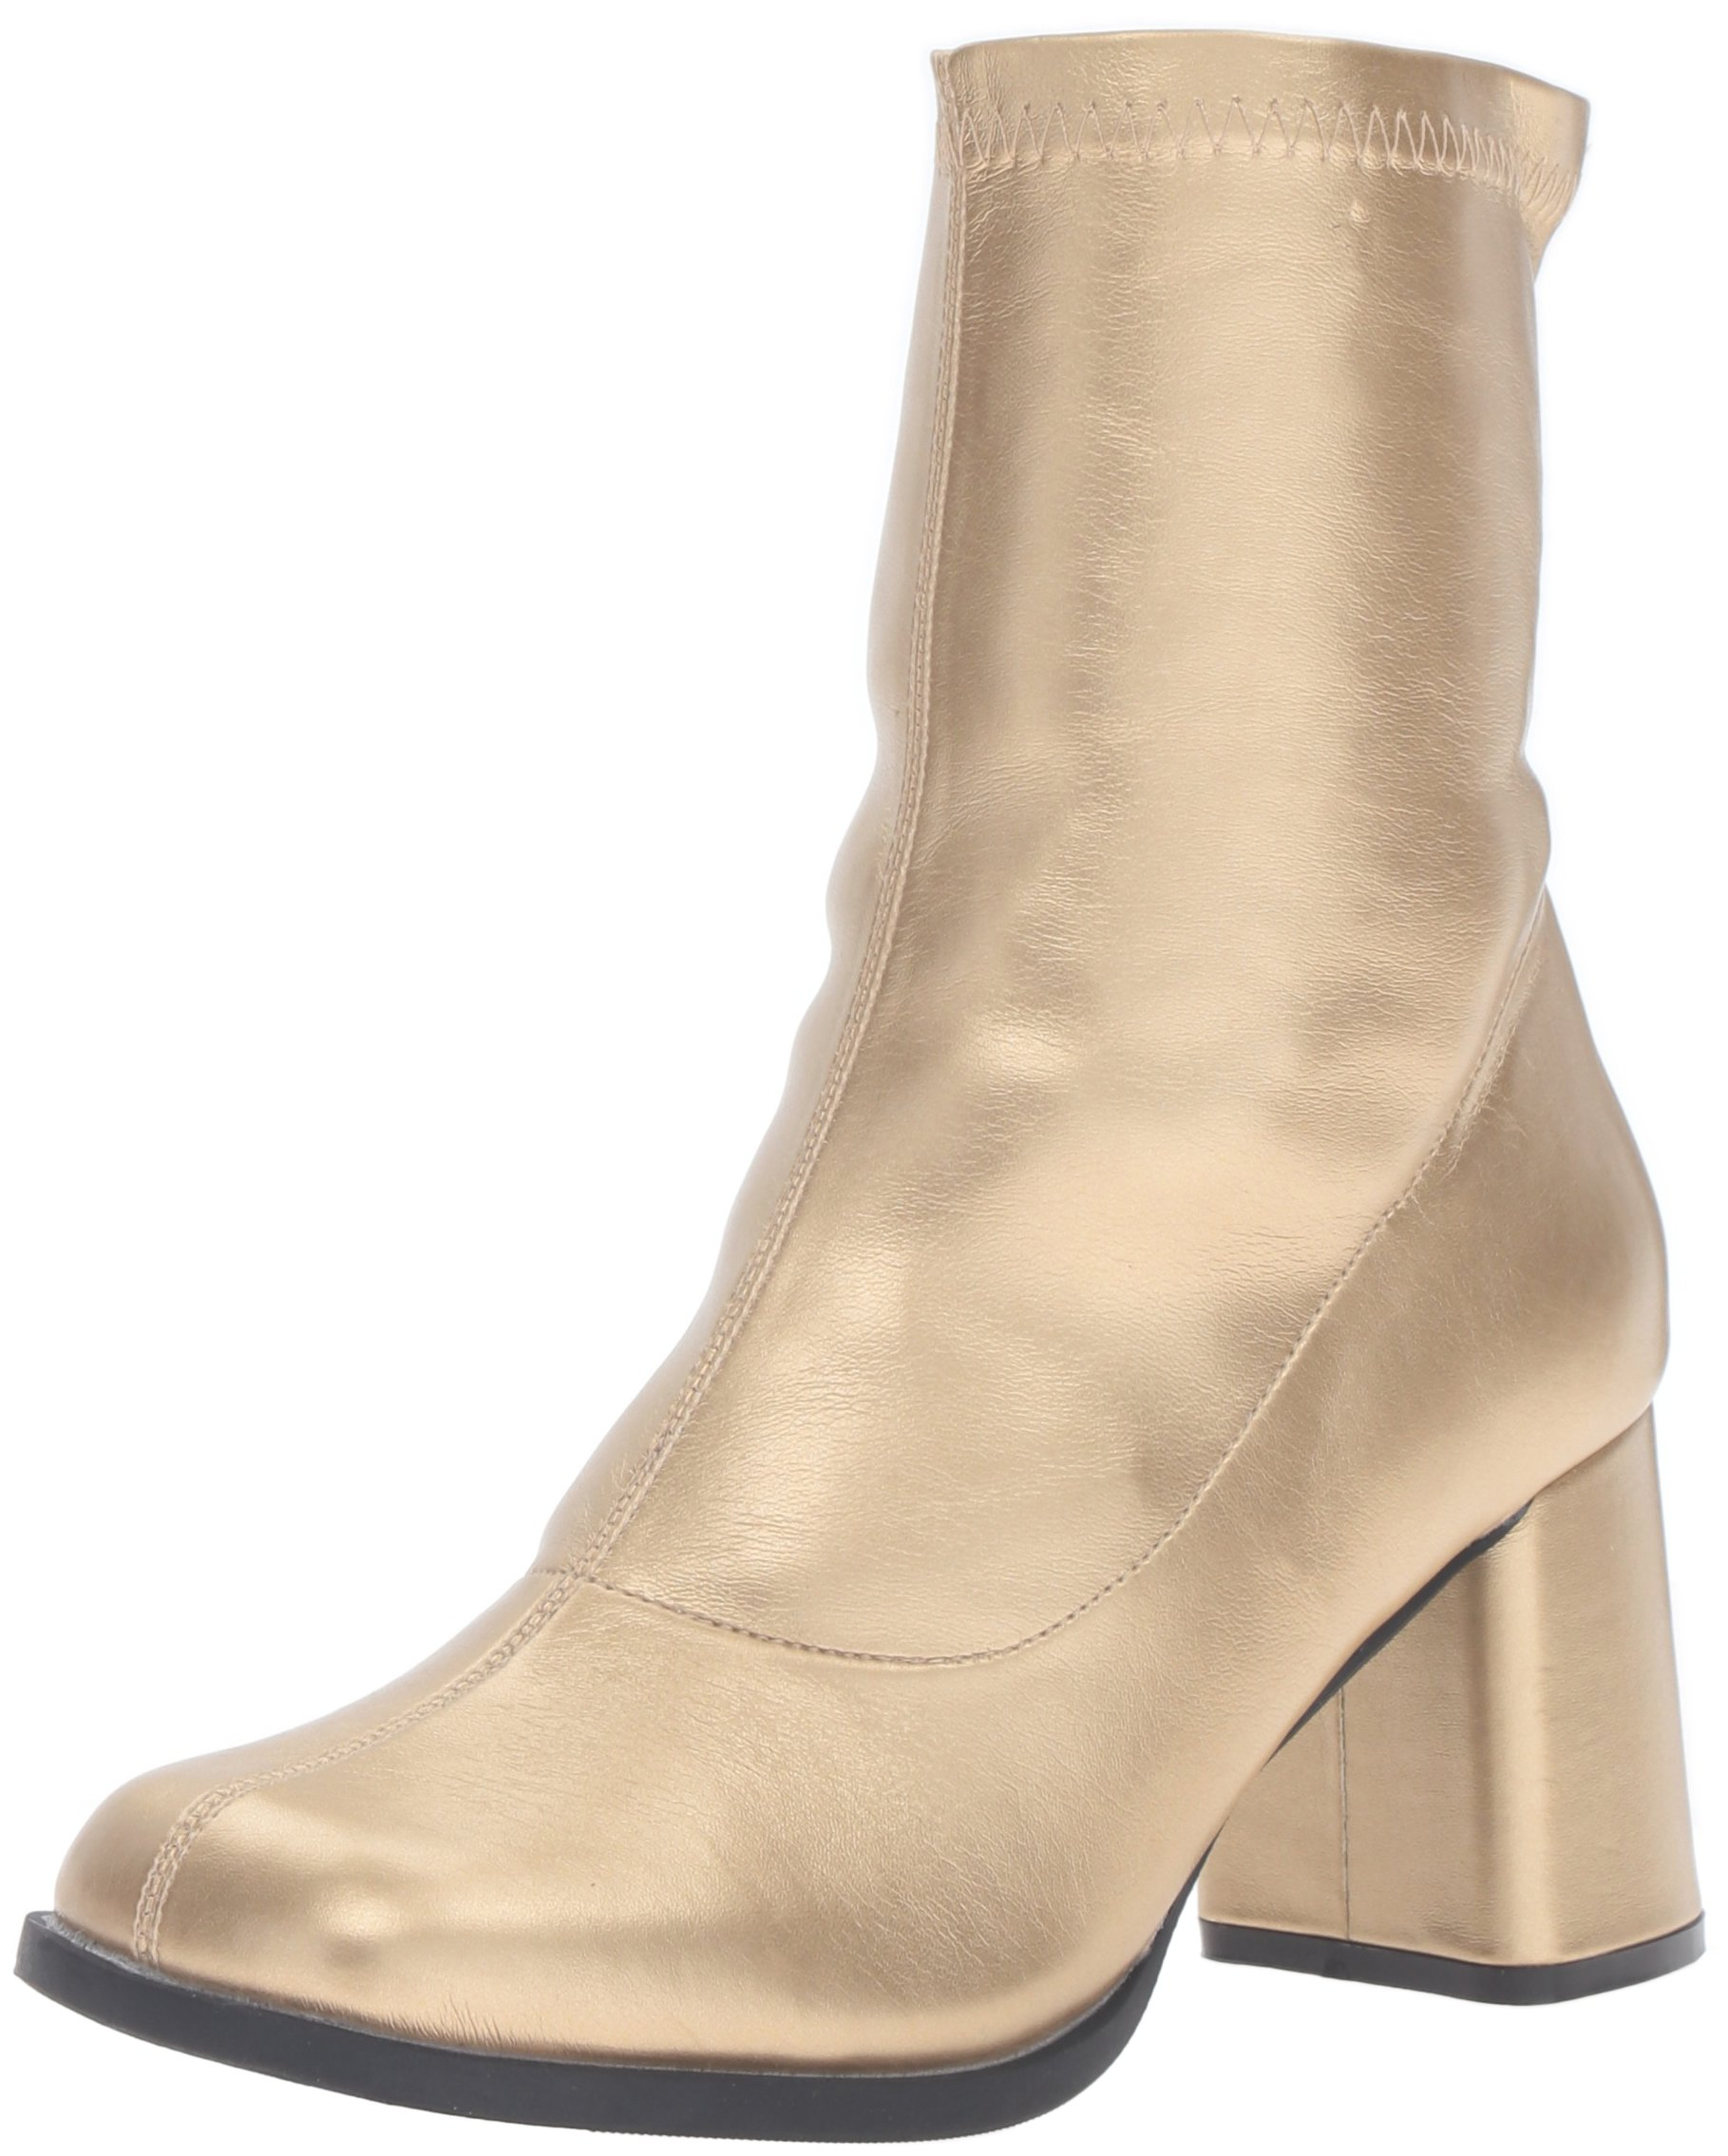 Funtasma Women's Gogo150/Gpu Boot, Gold Stripe Polyurethane, 11 M US